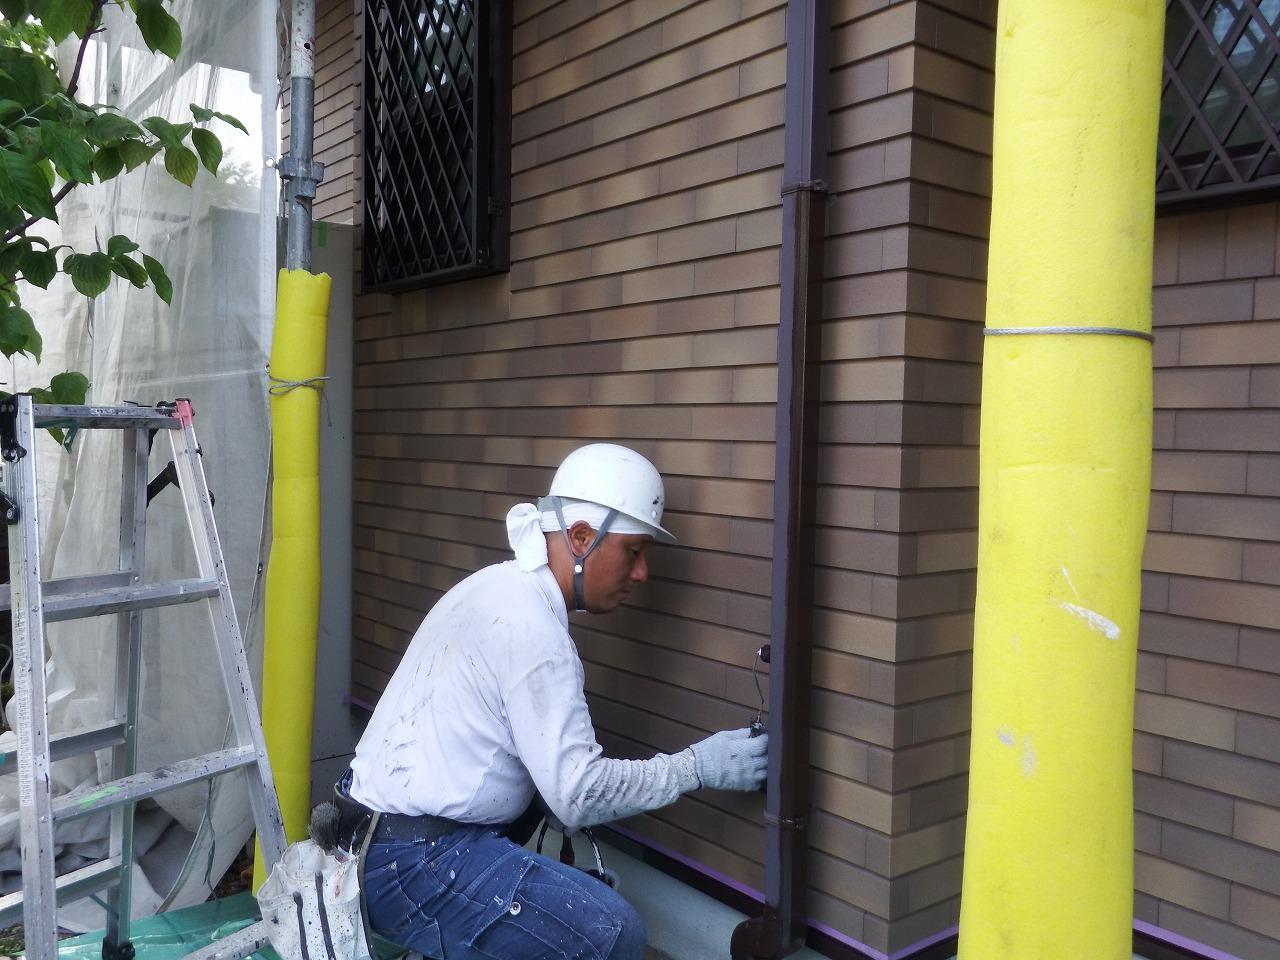 生駒市の外壁塗装工事現場で雨樋塗装(縦樋)